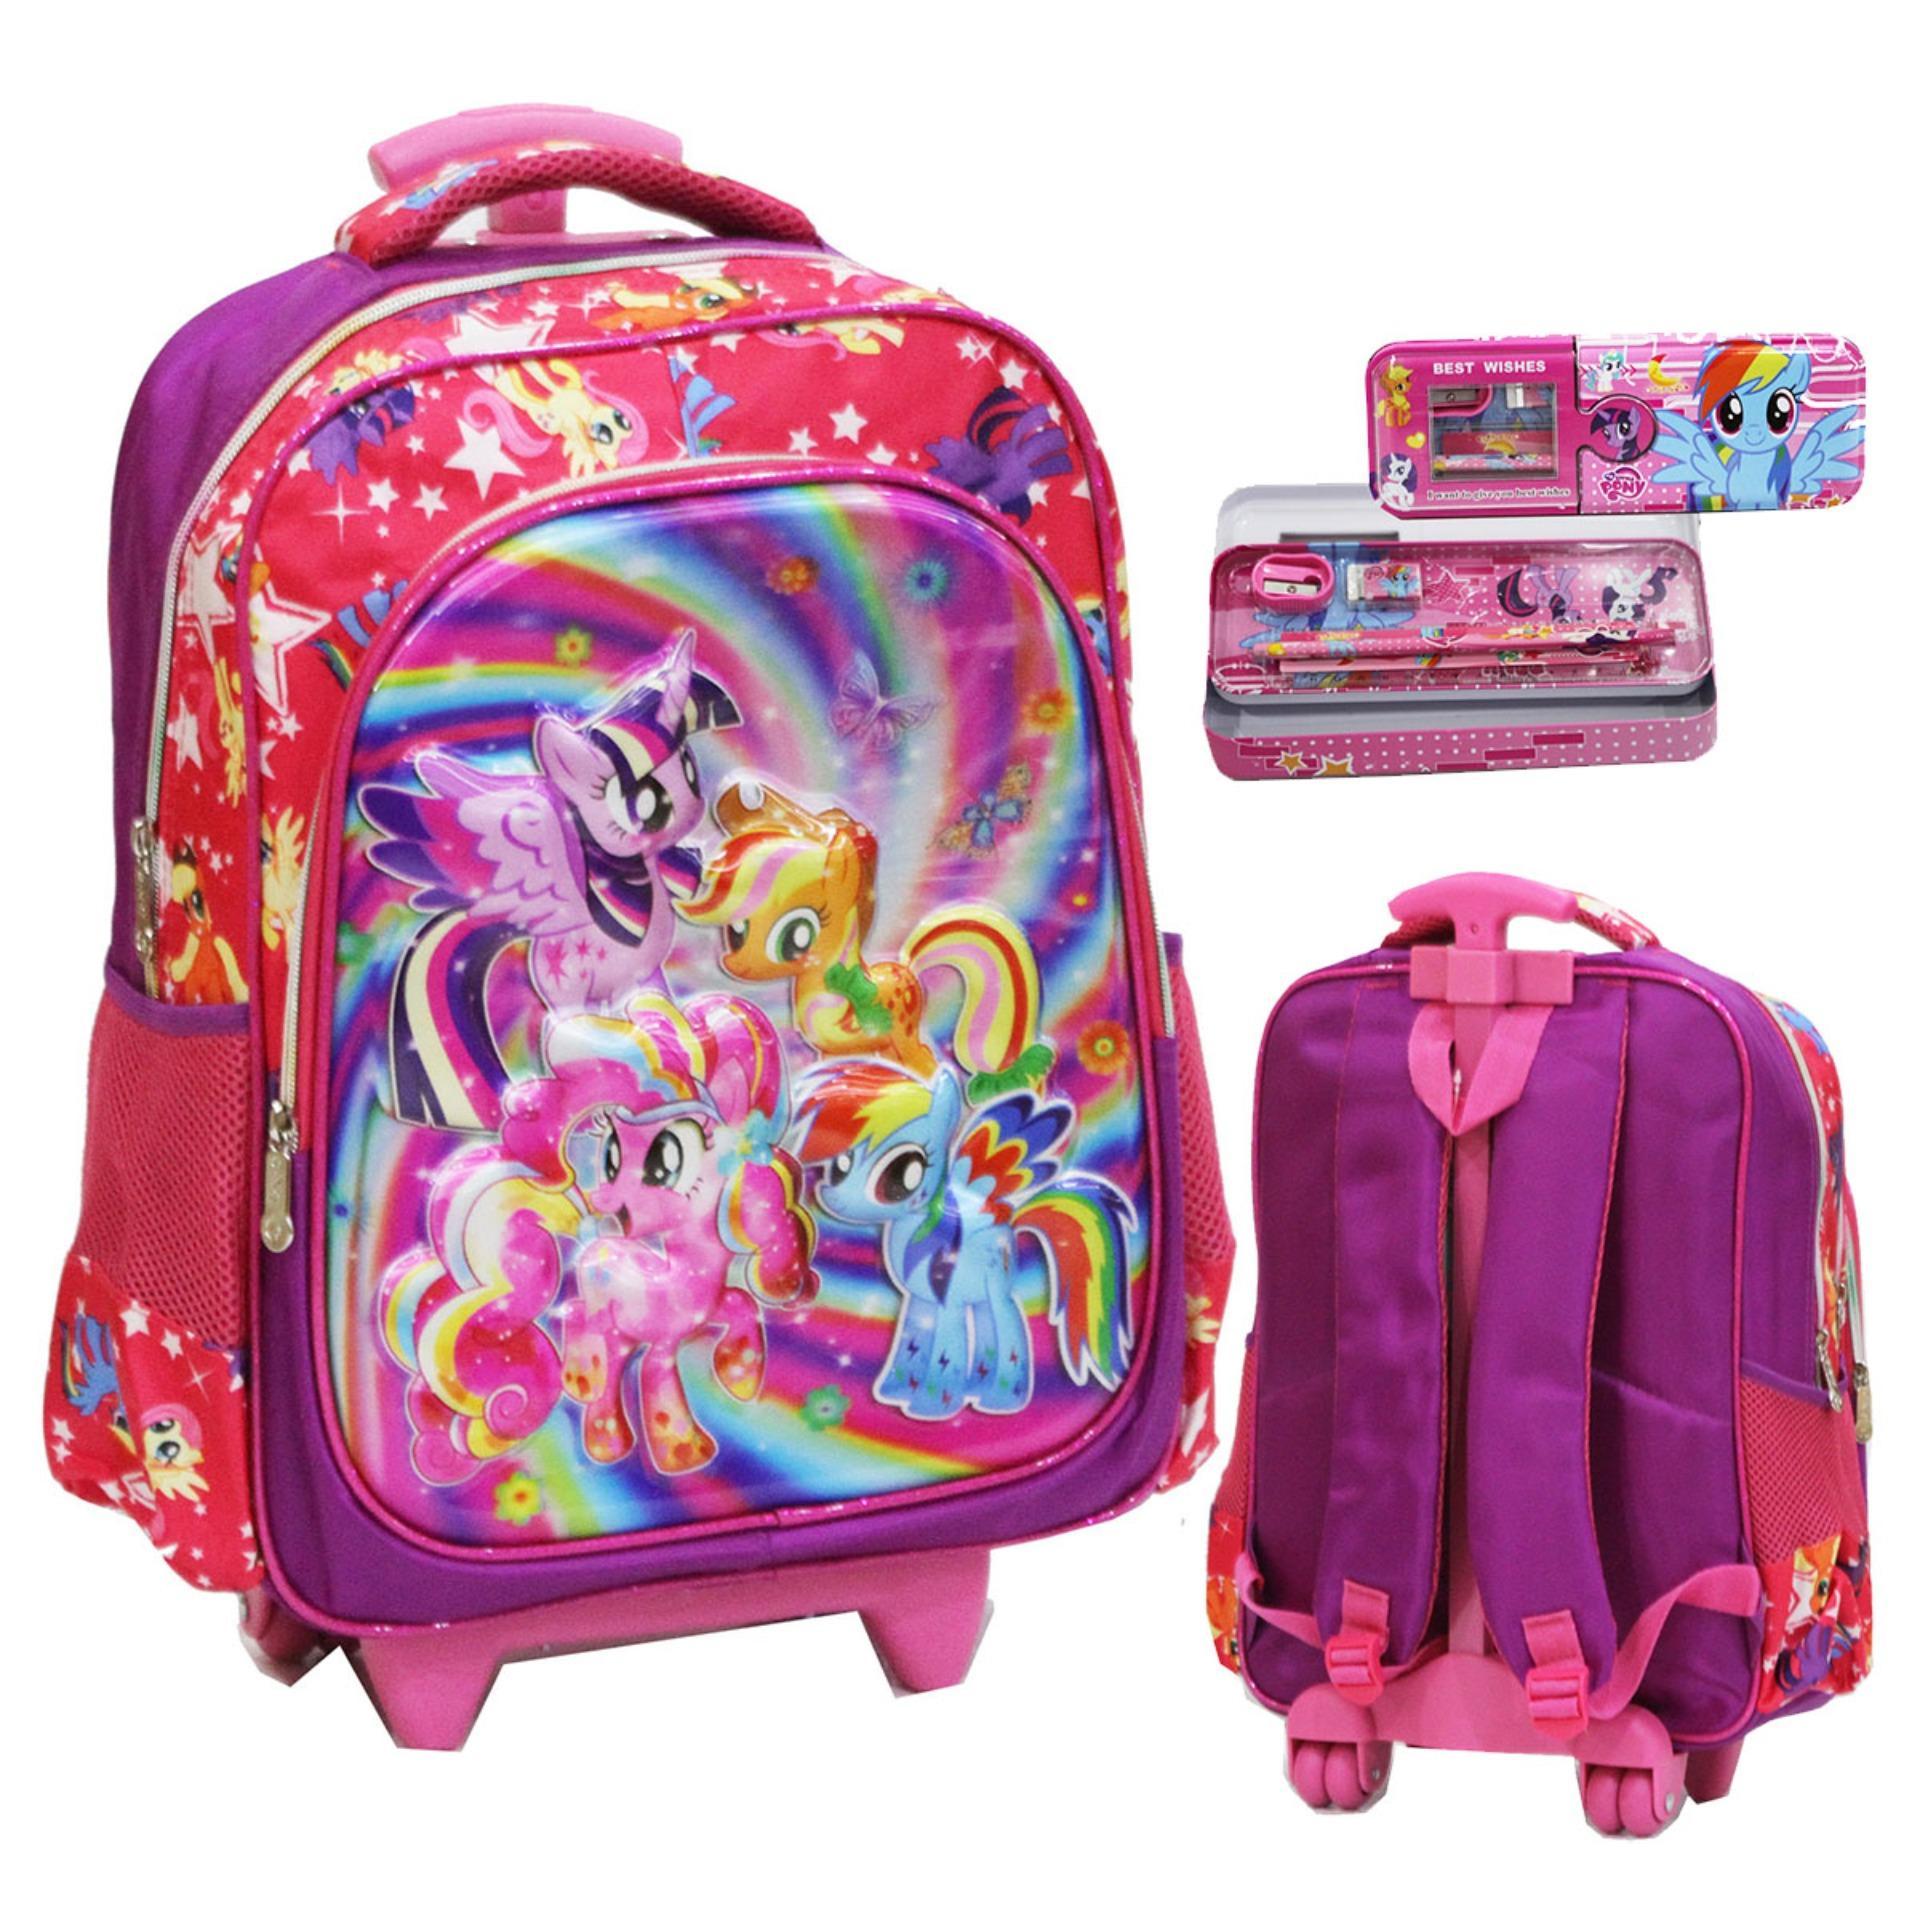 Onlan My Little Pony 5D Timbul Hologram Tas Trolley Sd Ukuran Besar Dan Kotak Pensil Pink Onlan Diskon 50